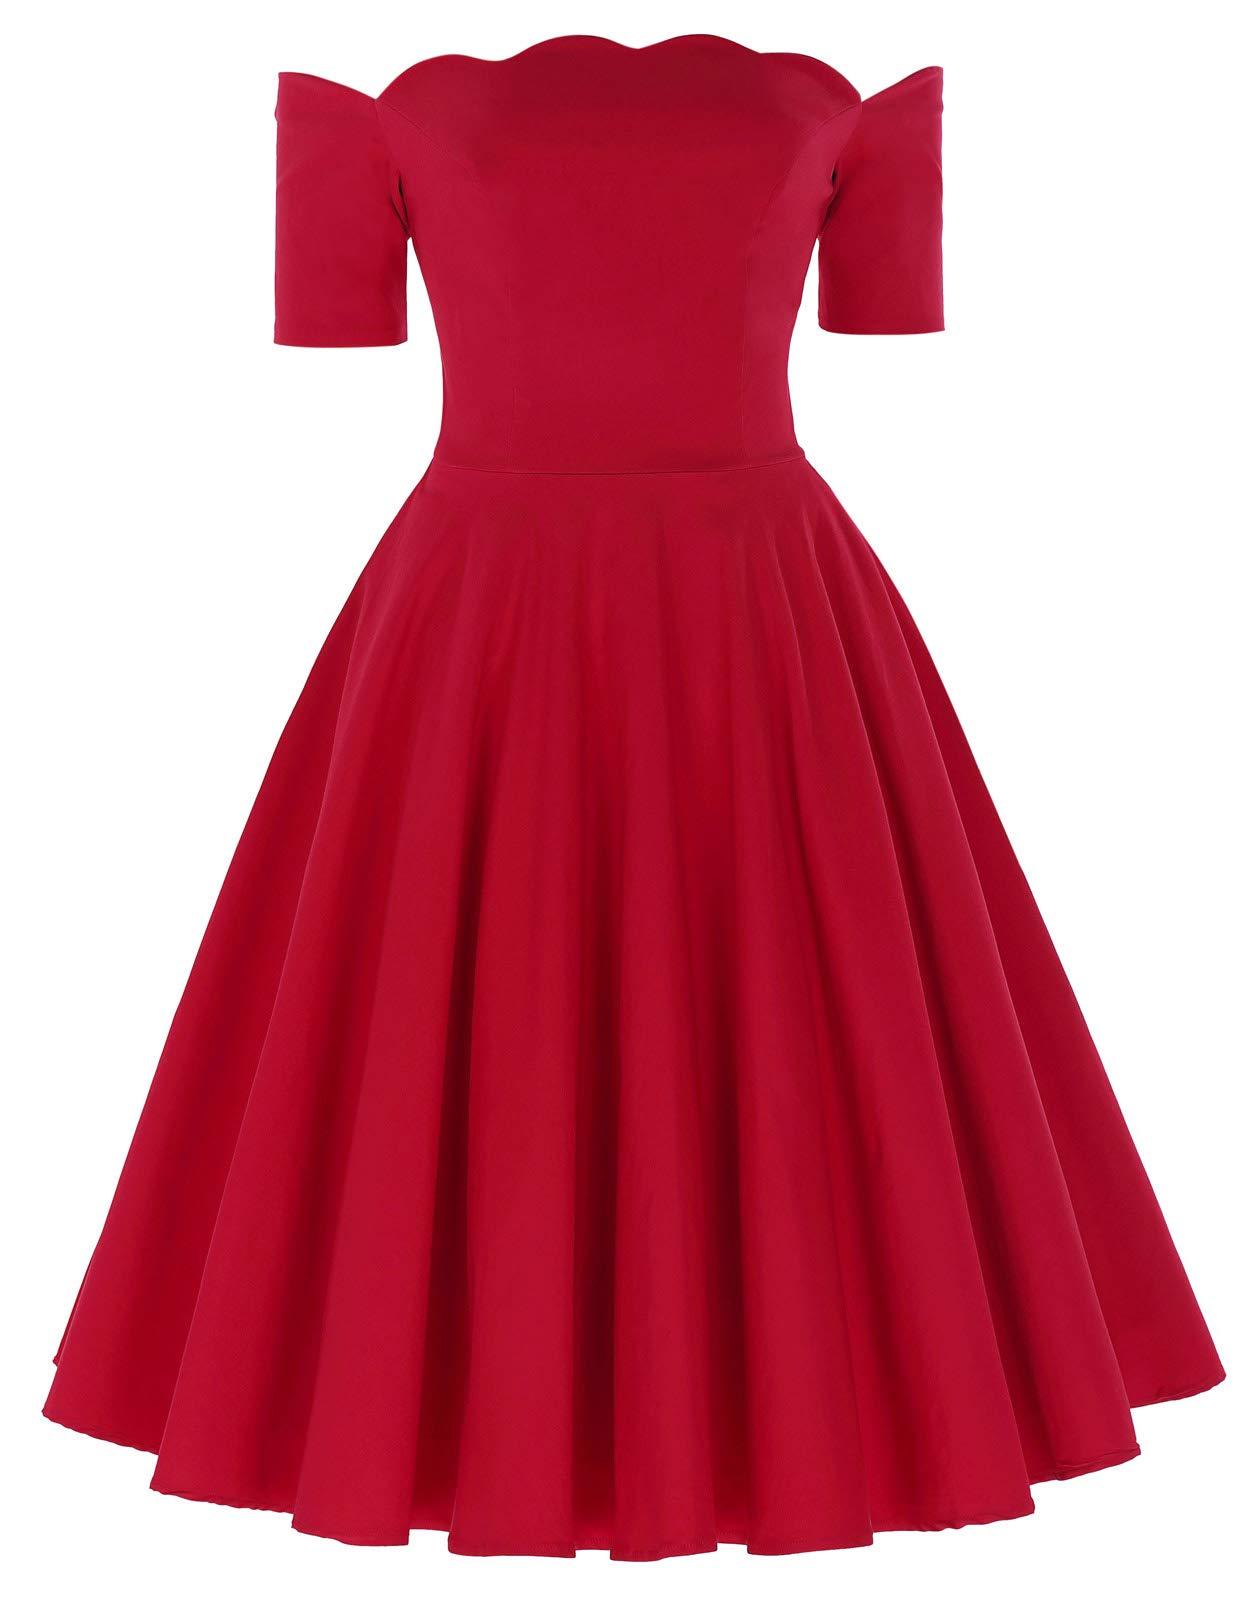 Red Dress - Women's Off Shoulder High Split Long Formal Party Dress Evening Gown